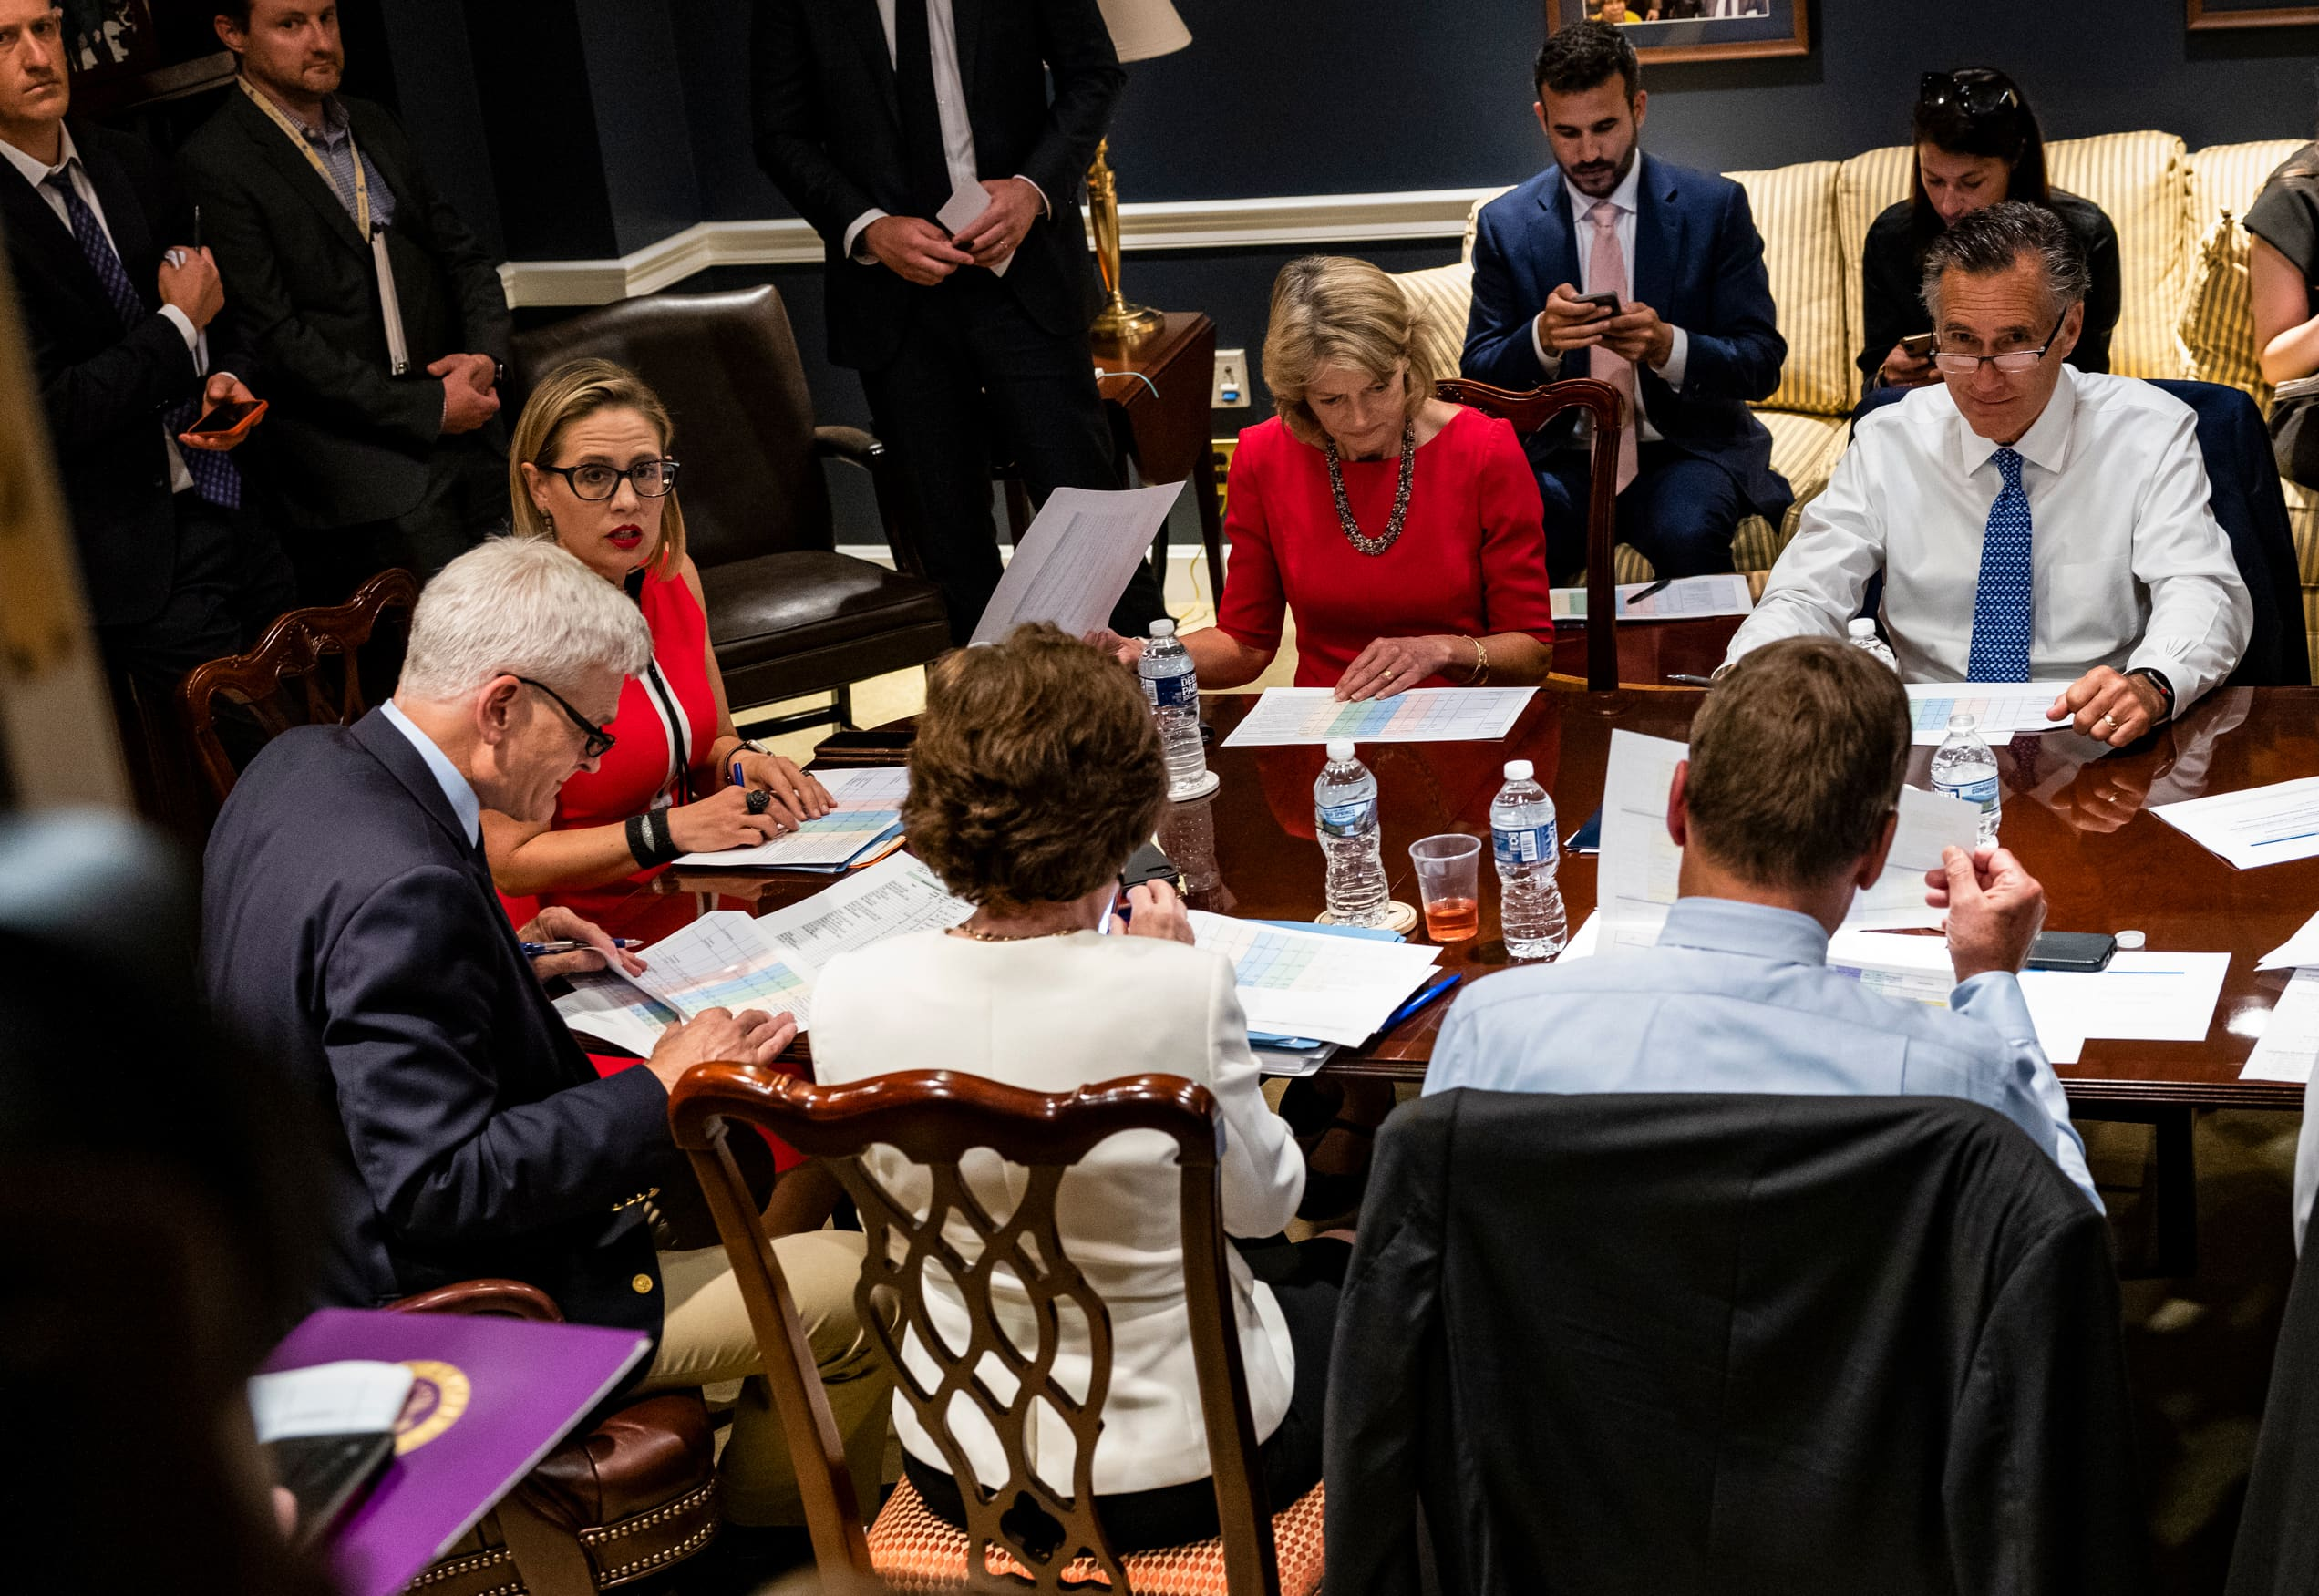 Bipartisan Senate group nears deal